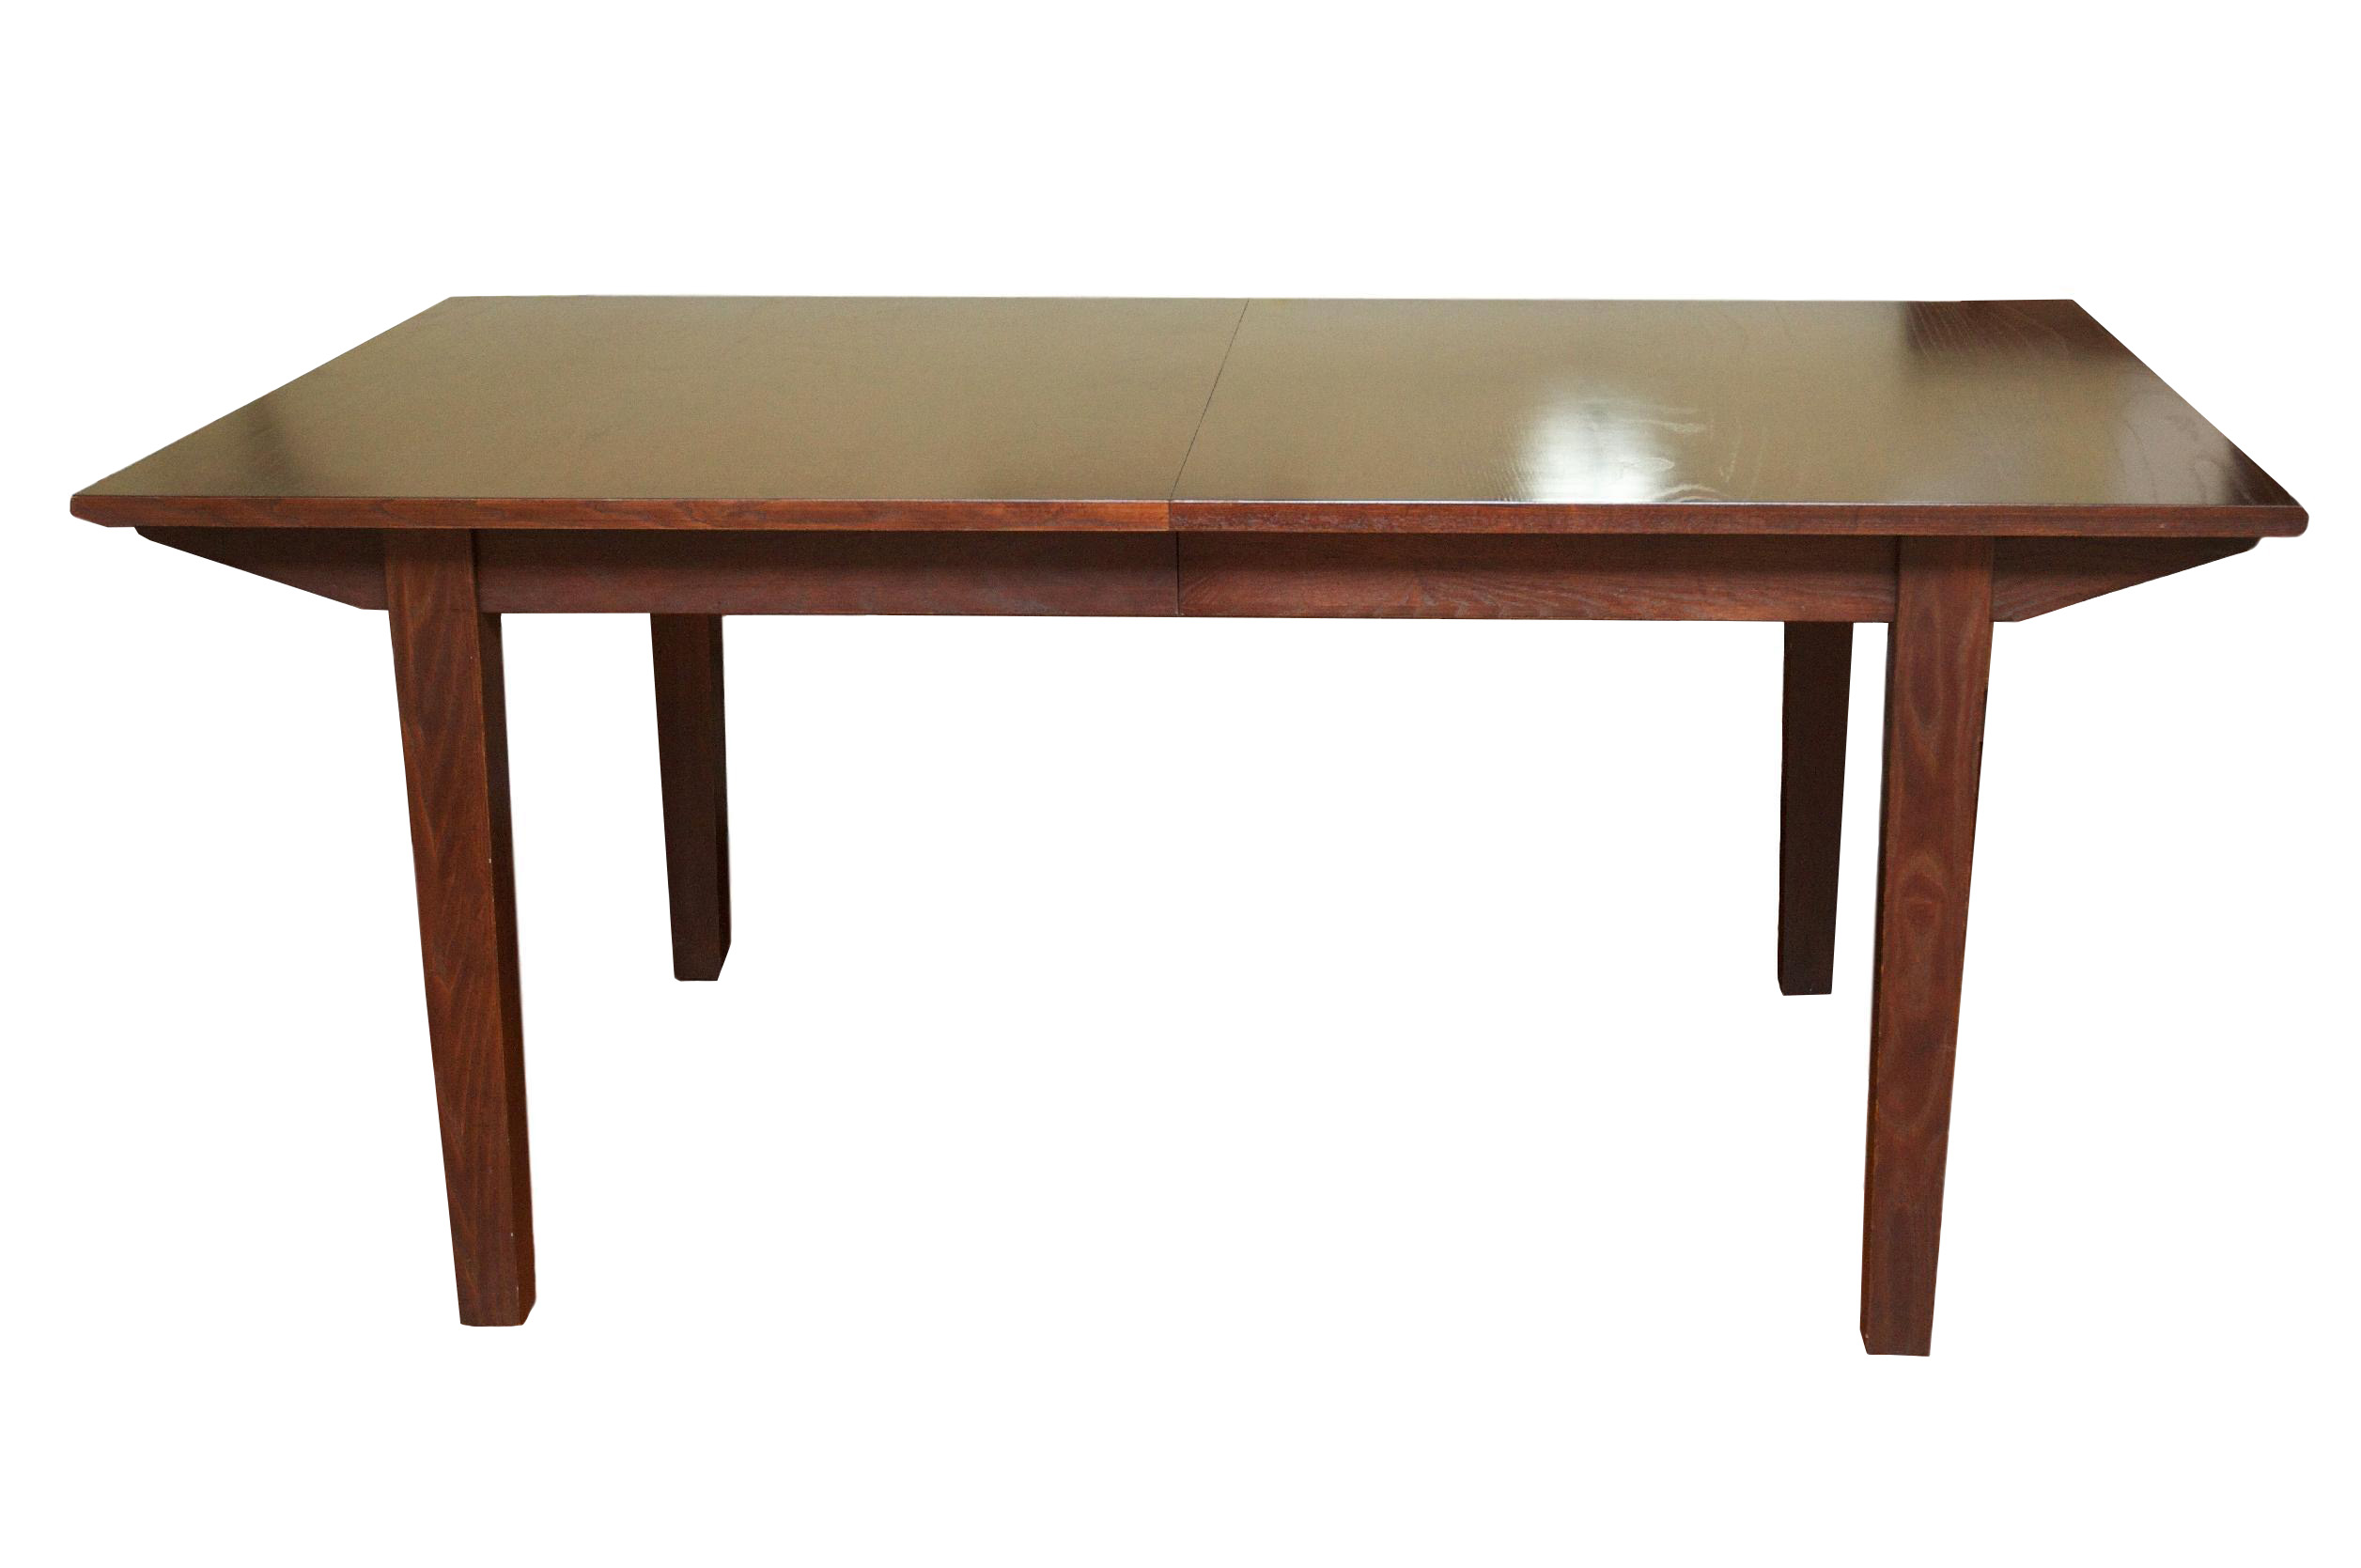 ethan allen horizon collection dining table chairish